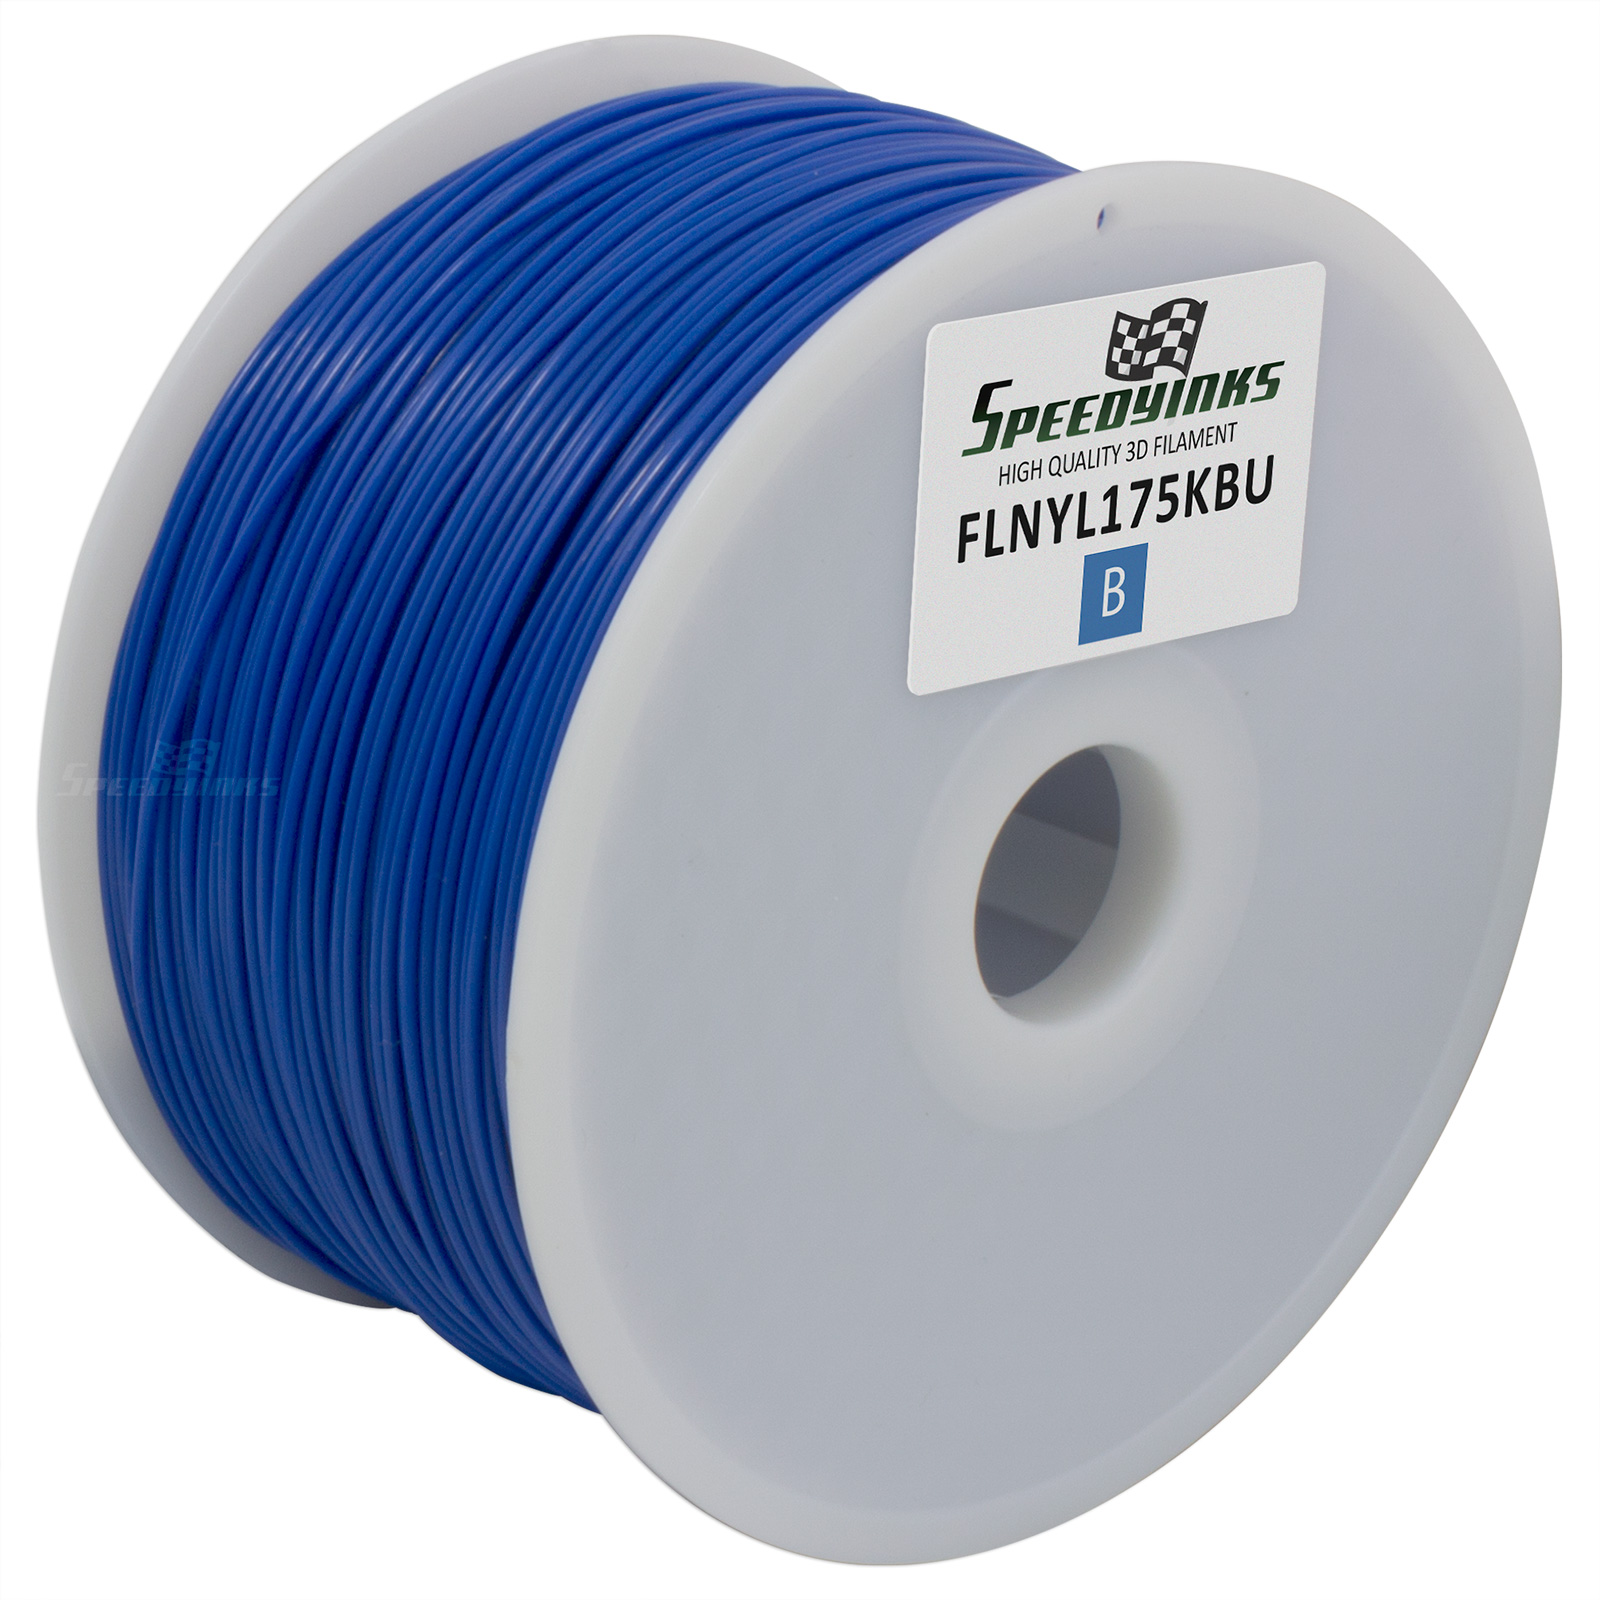 Speedy Inks - 1.75mm 1kg Nylon Blue Filament for 3D Printers